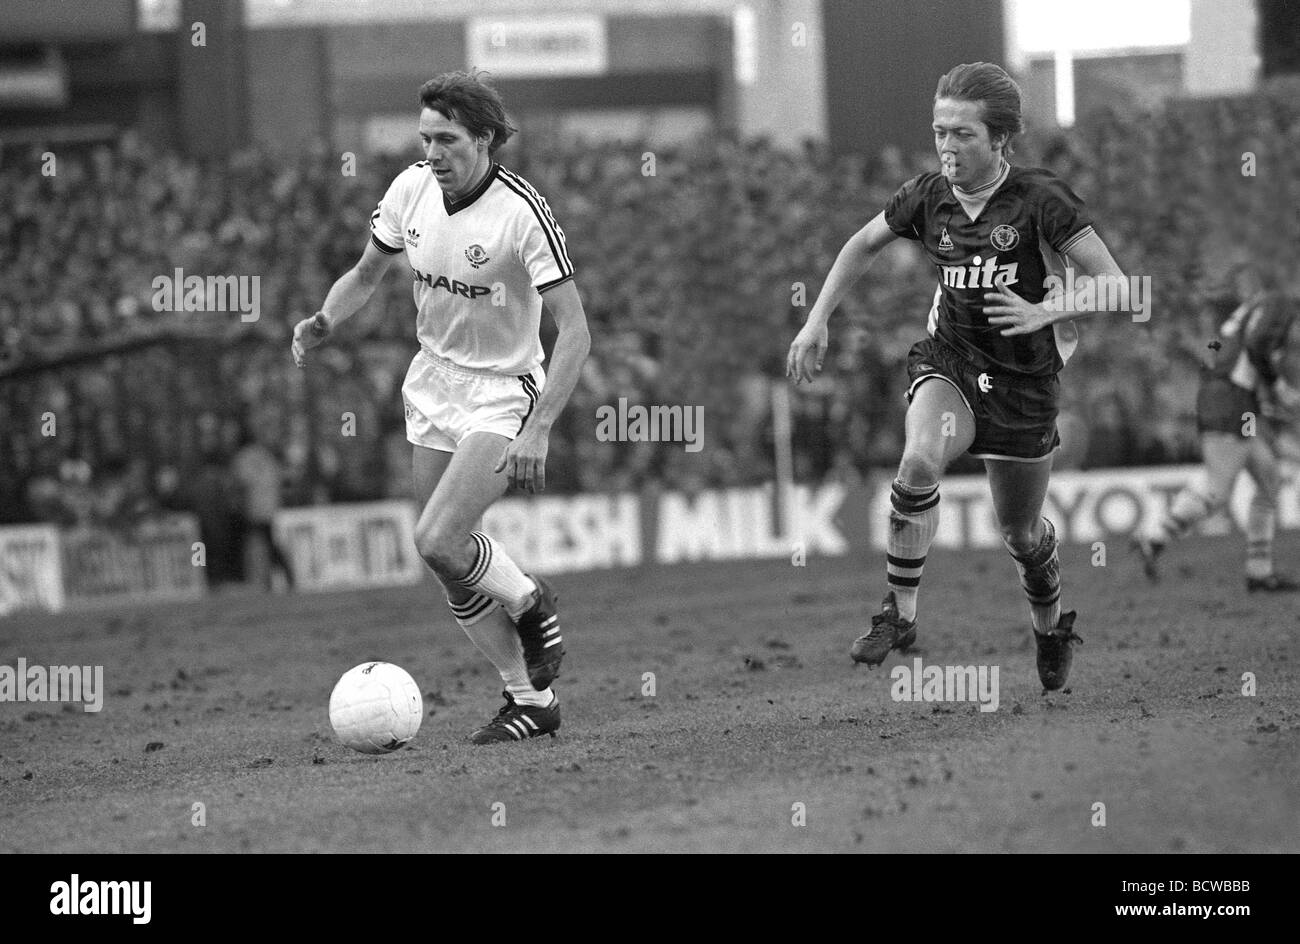 Aston Villa v Manchester United at Villa Park Uniteds Arnold Muhren and Villa s Alan Curbishley - Stock Image